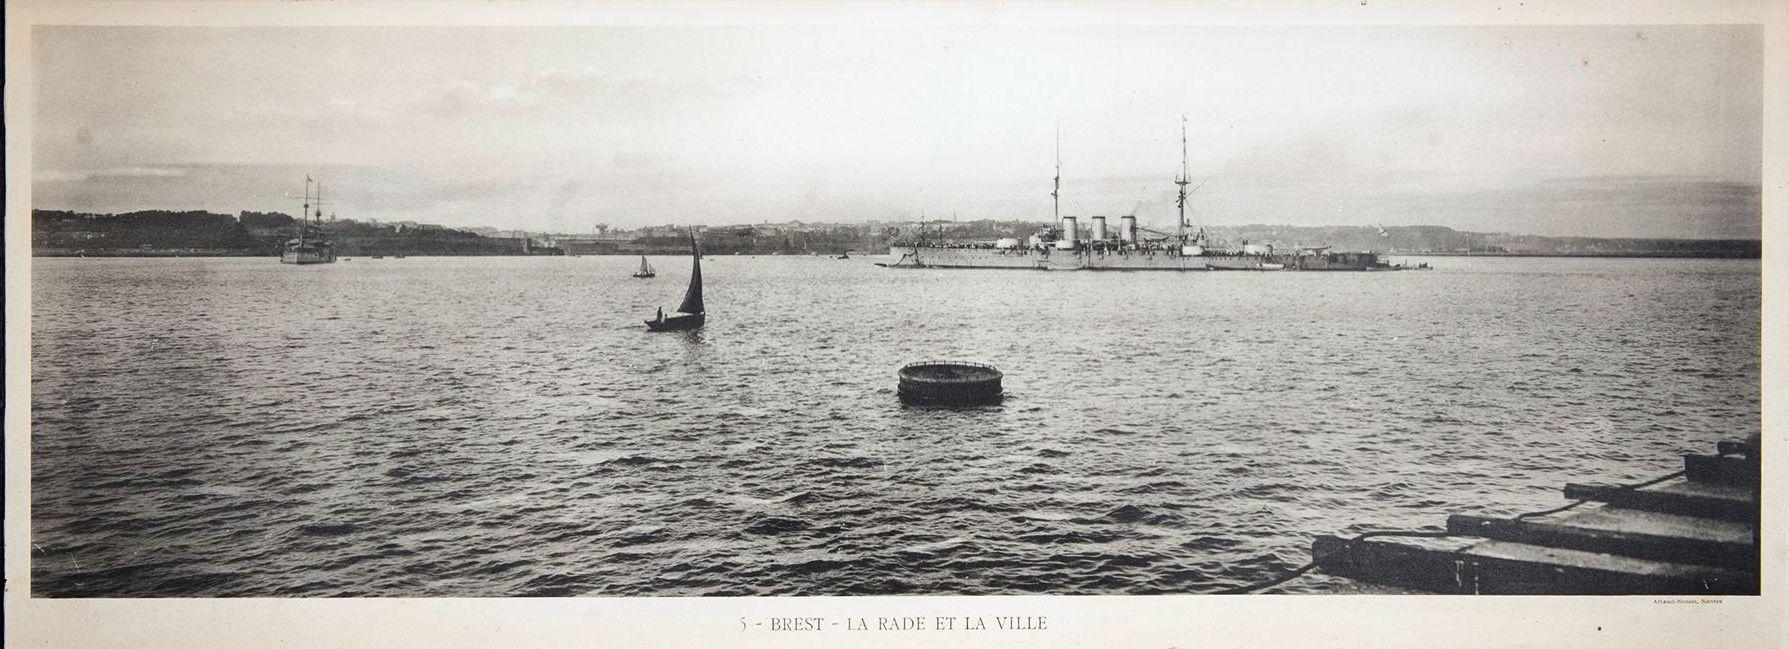 Фототипия флагмана Балтийского флота броненосного крейскра «Рюрик» на рейде города Брест.